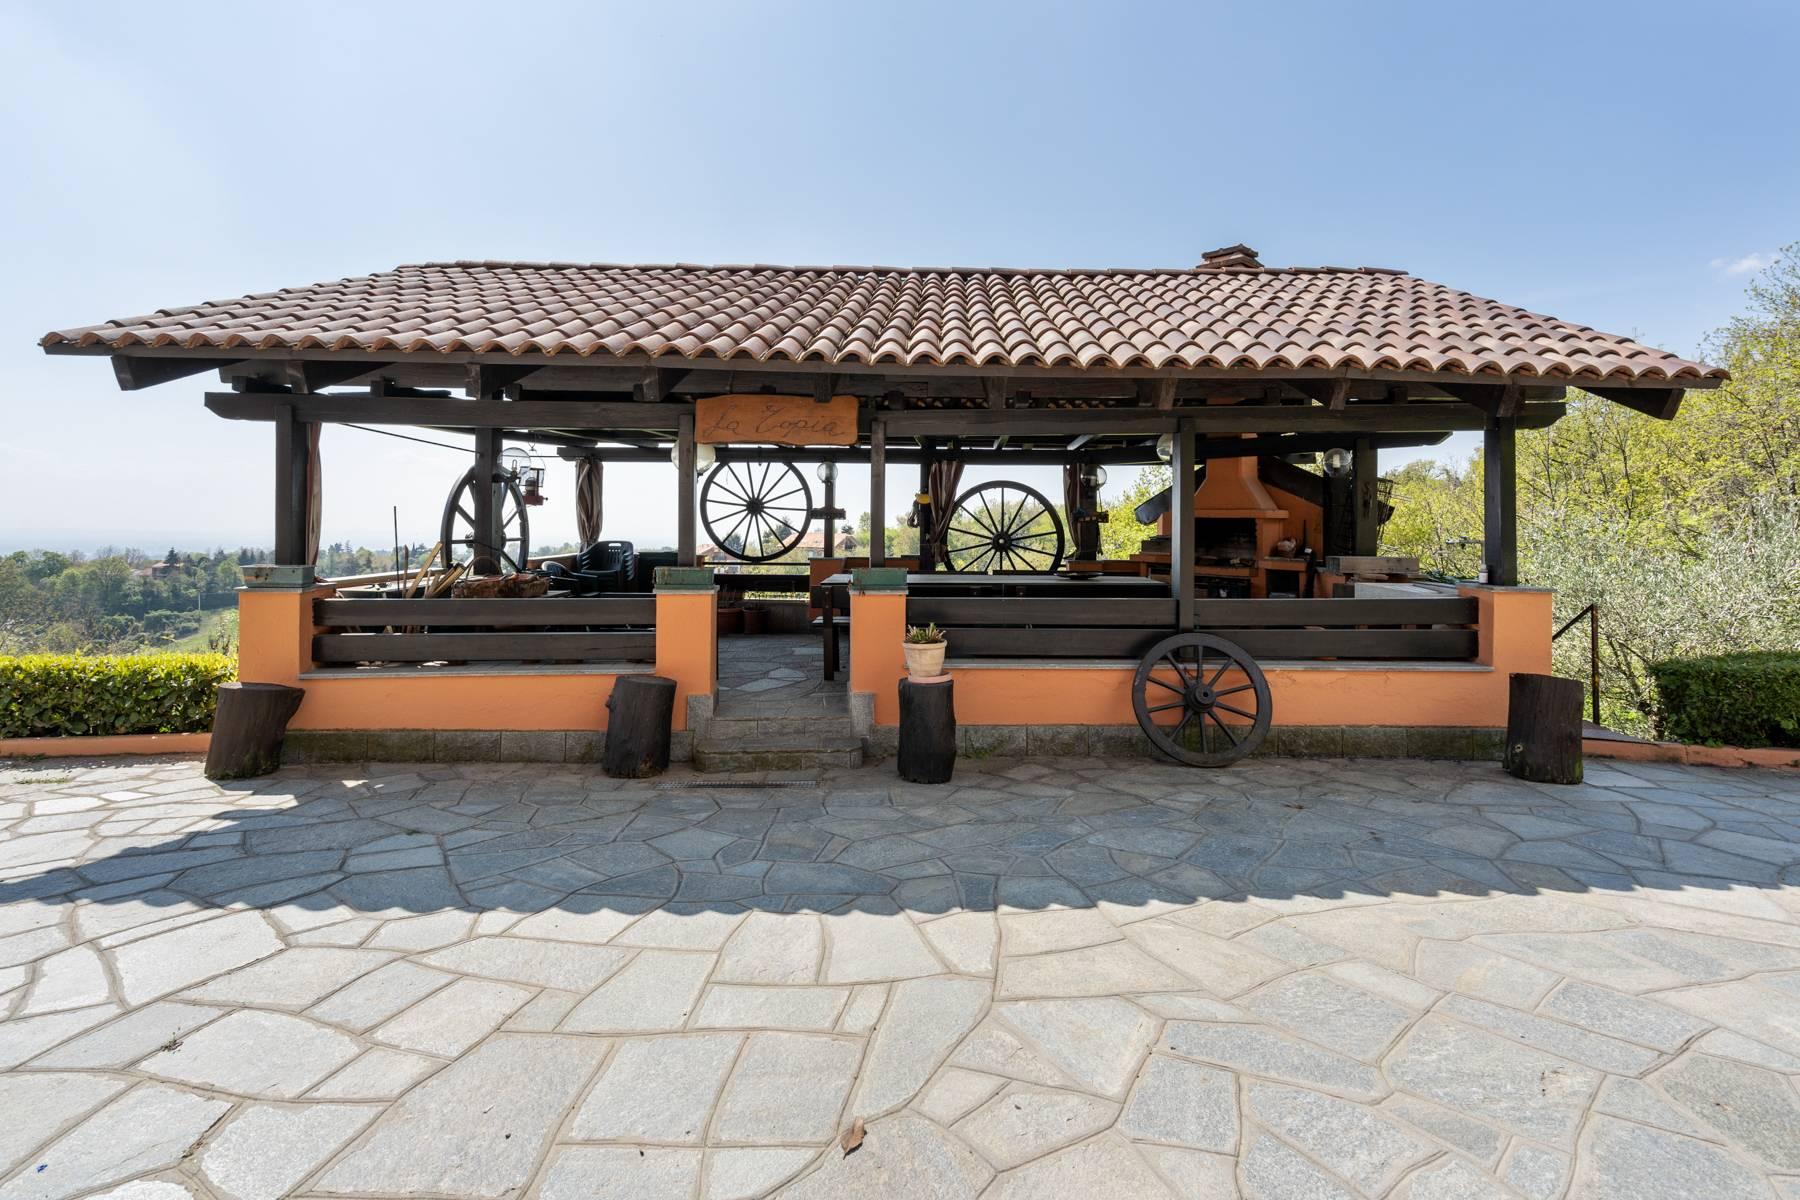 Villa in Vendita a Baldissero Torinese: 5 locali, 503 mq - Foto 5